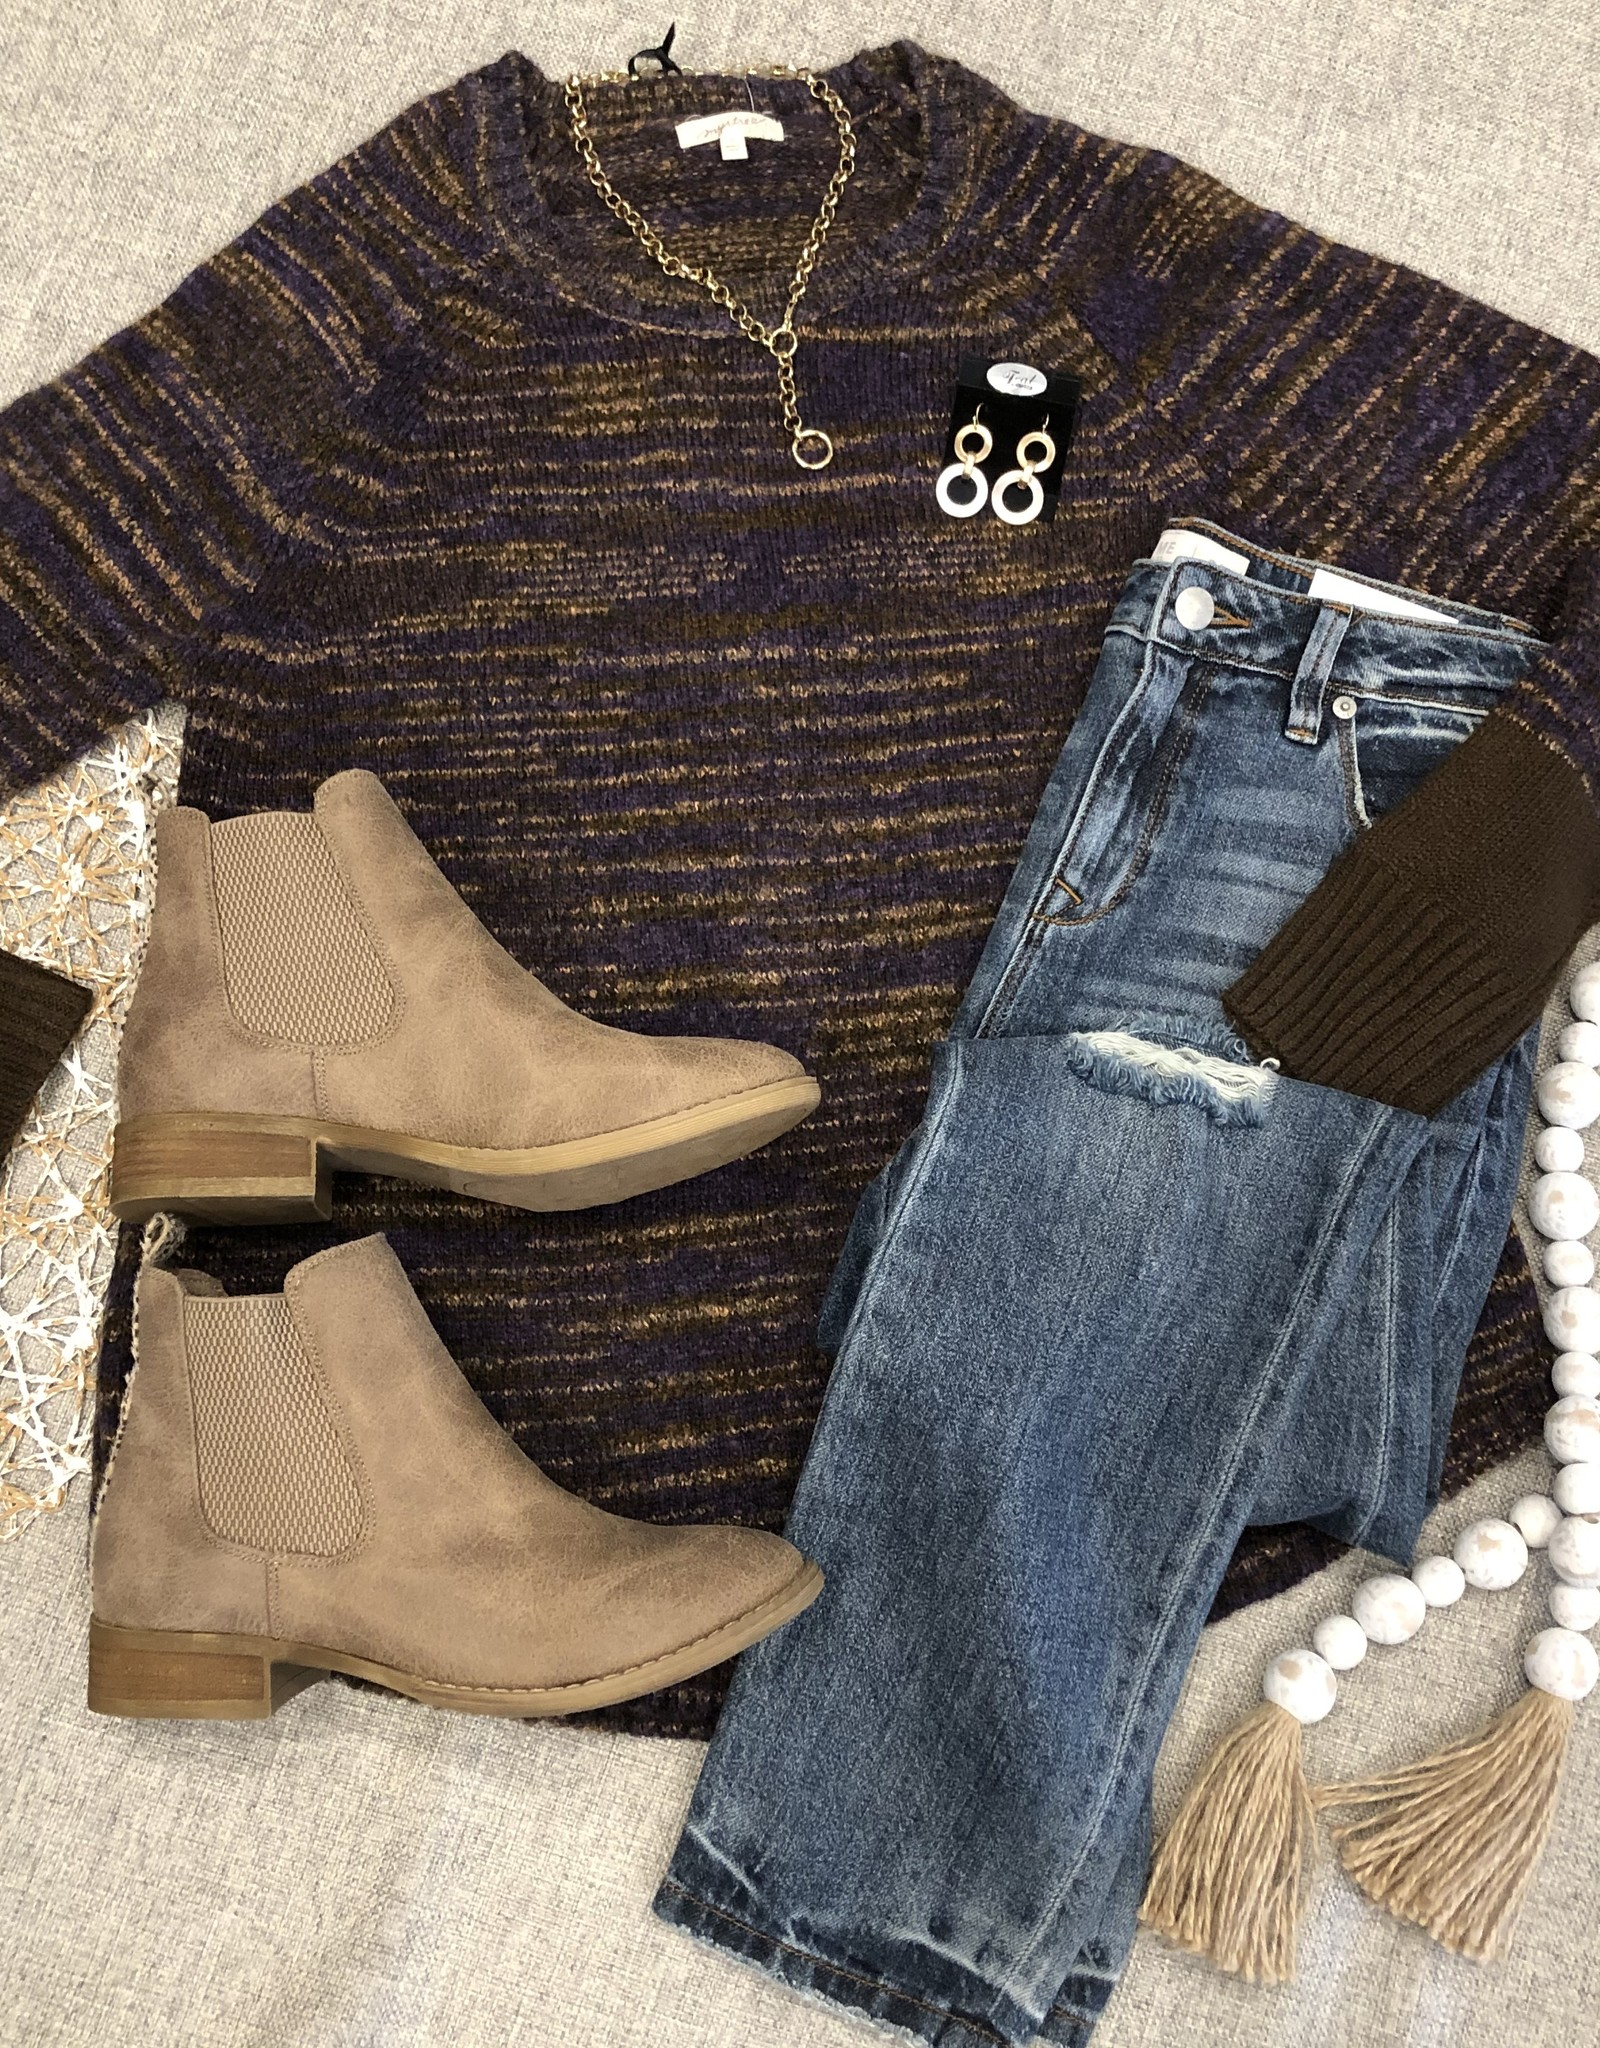 Mixed Plum Sweater